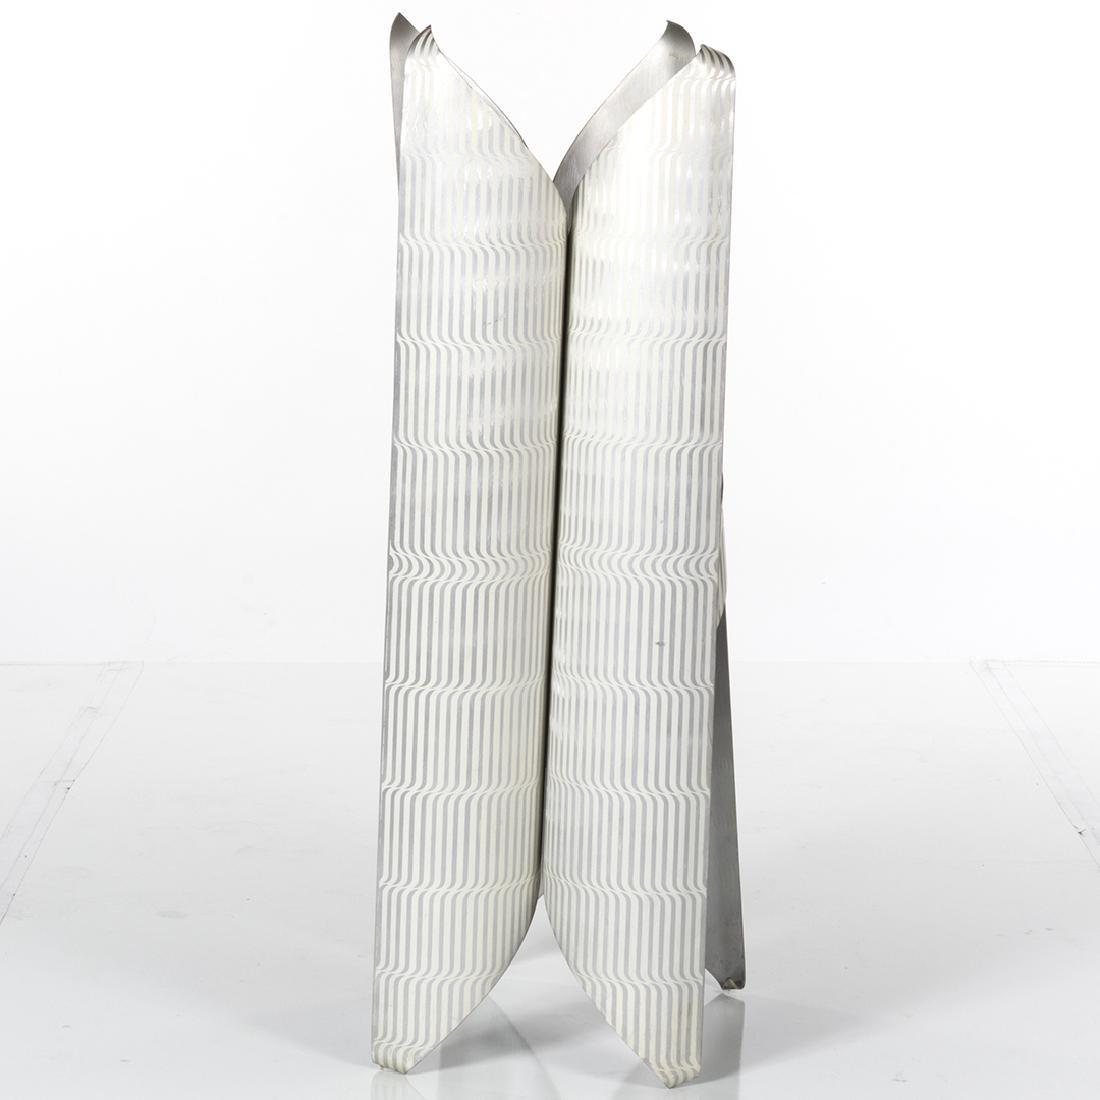 Lorenzo Burchiellaro Floor Lamp - 3